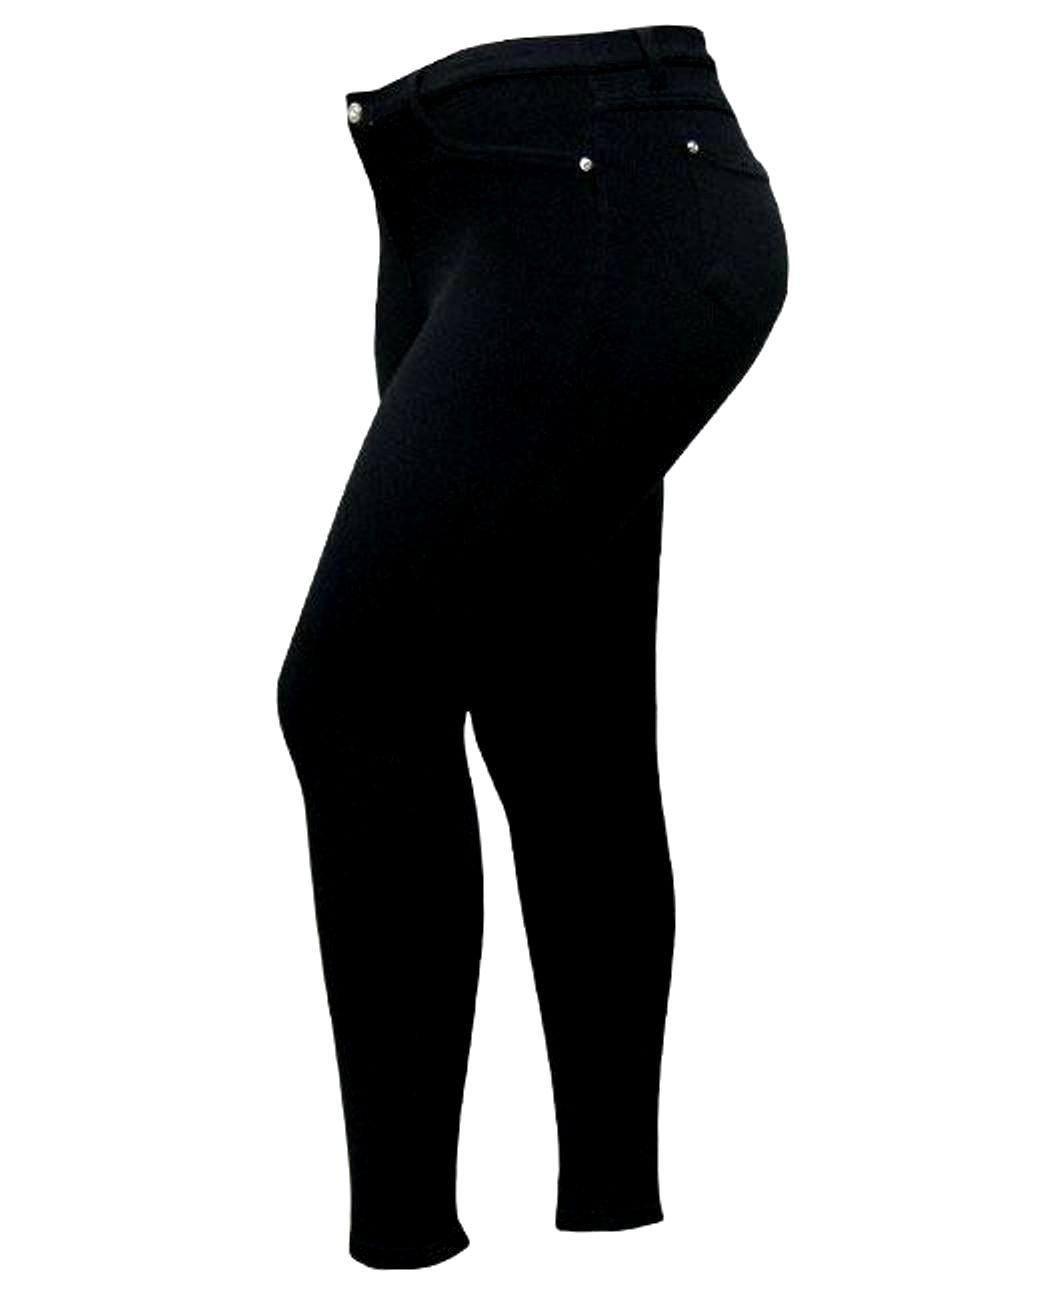 1826 Women's Butt Lift Plus Size Super Comfy Moleton Skinny Stretch Jeggings Legging Cotton Yoga Pants